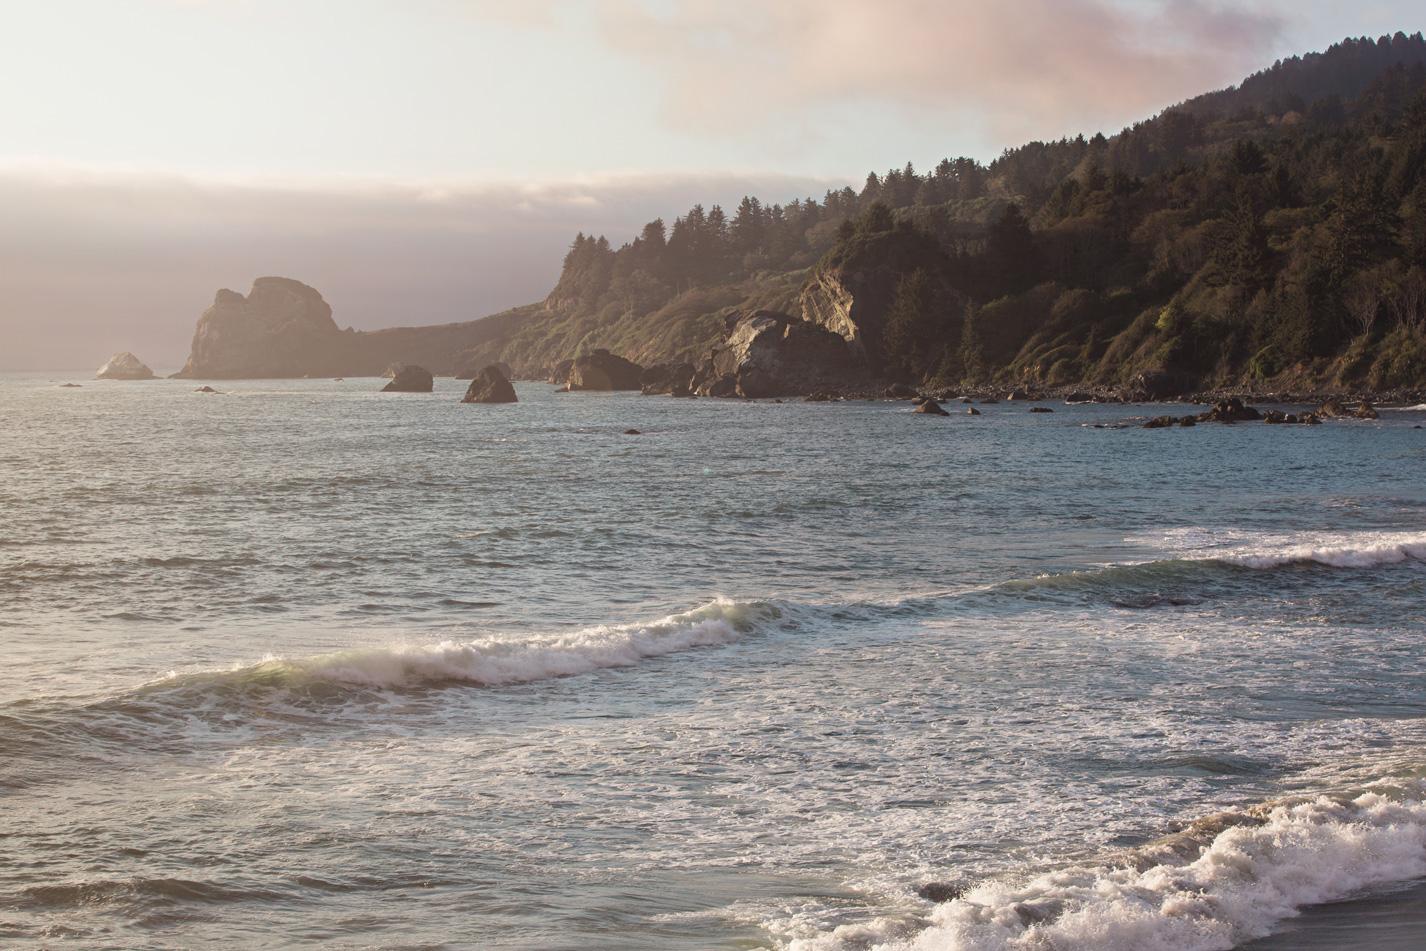 CindyGiovagnoli_Crater_Lake_National_Park_Cape_Perpetua_Heceta_Head_lighthouse_Pacific_Ocean_Cannon_Beach_haystack_Oregon_coast-005.jpg